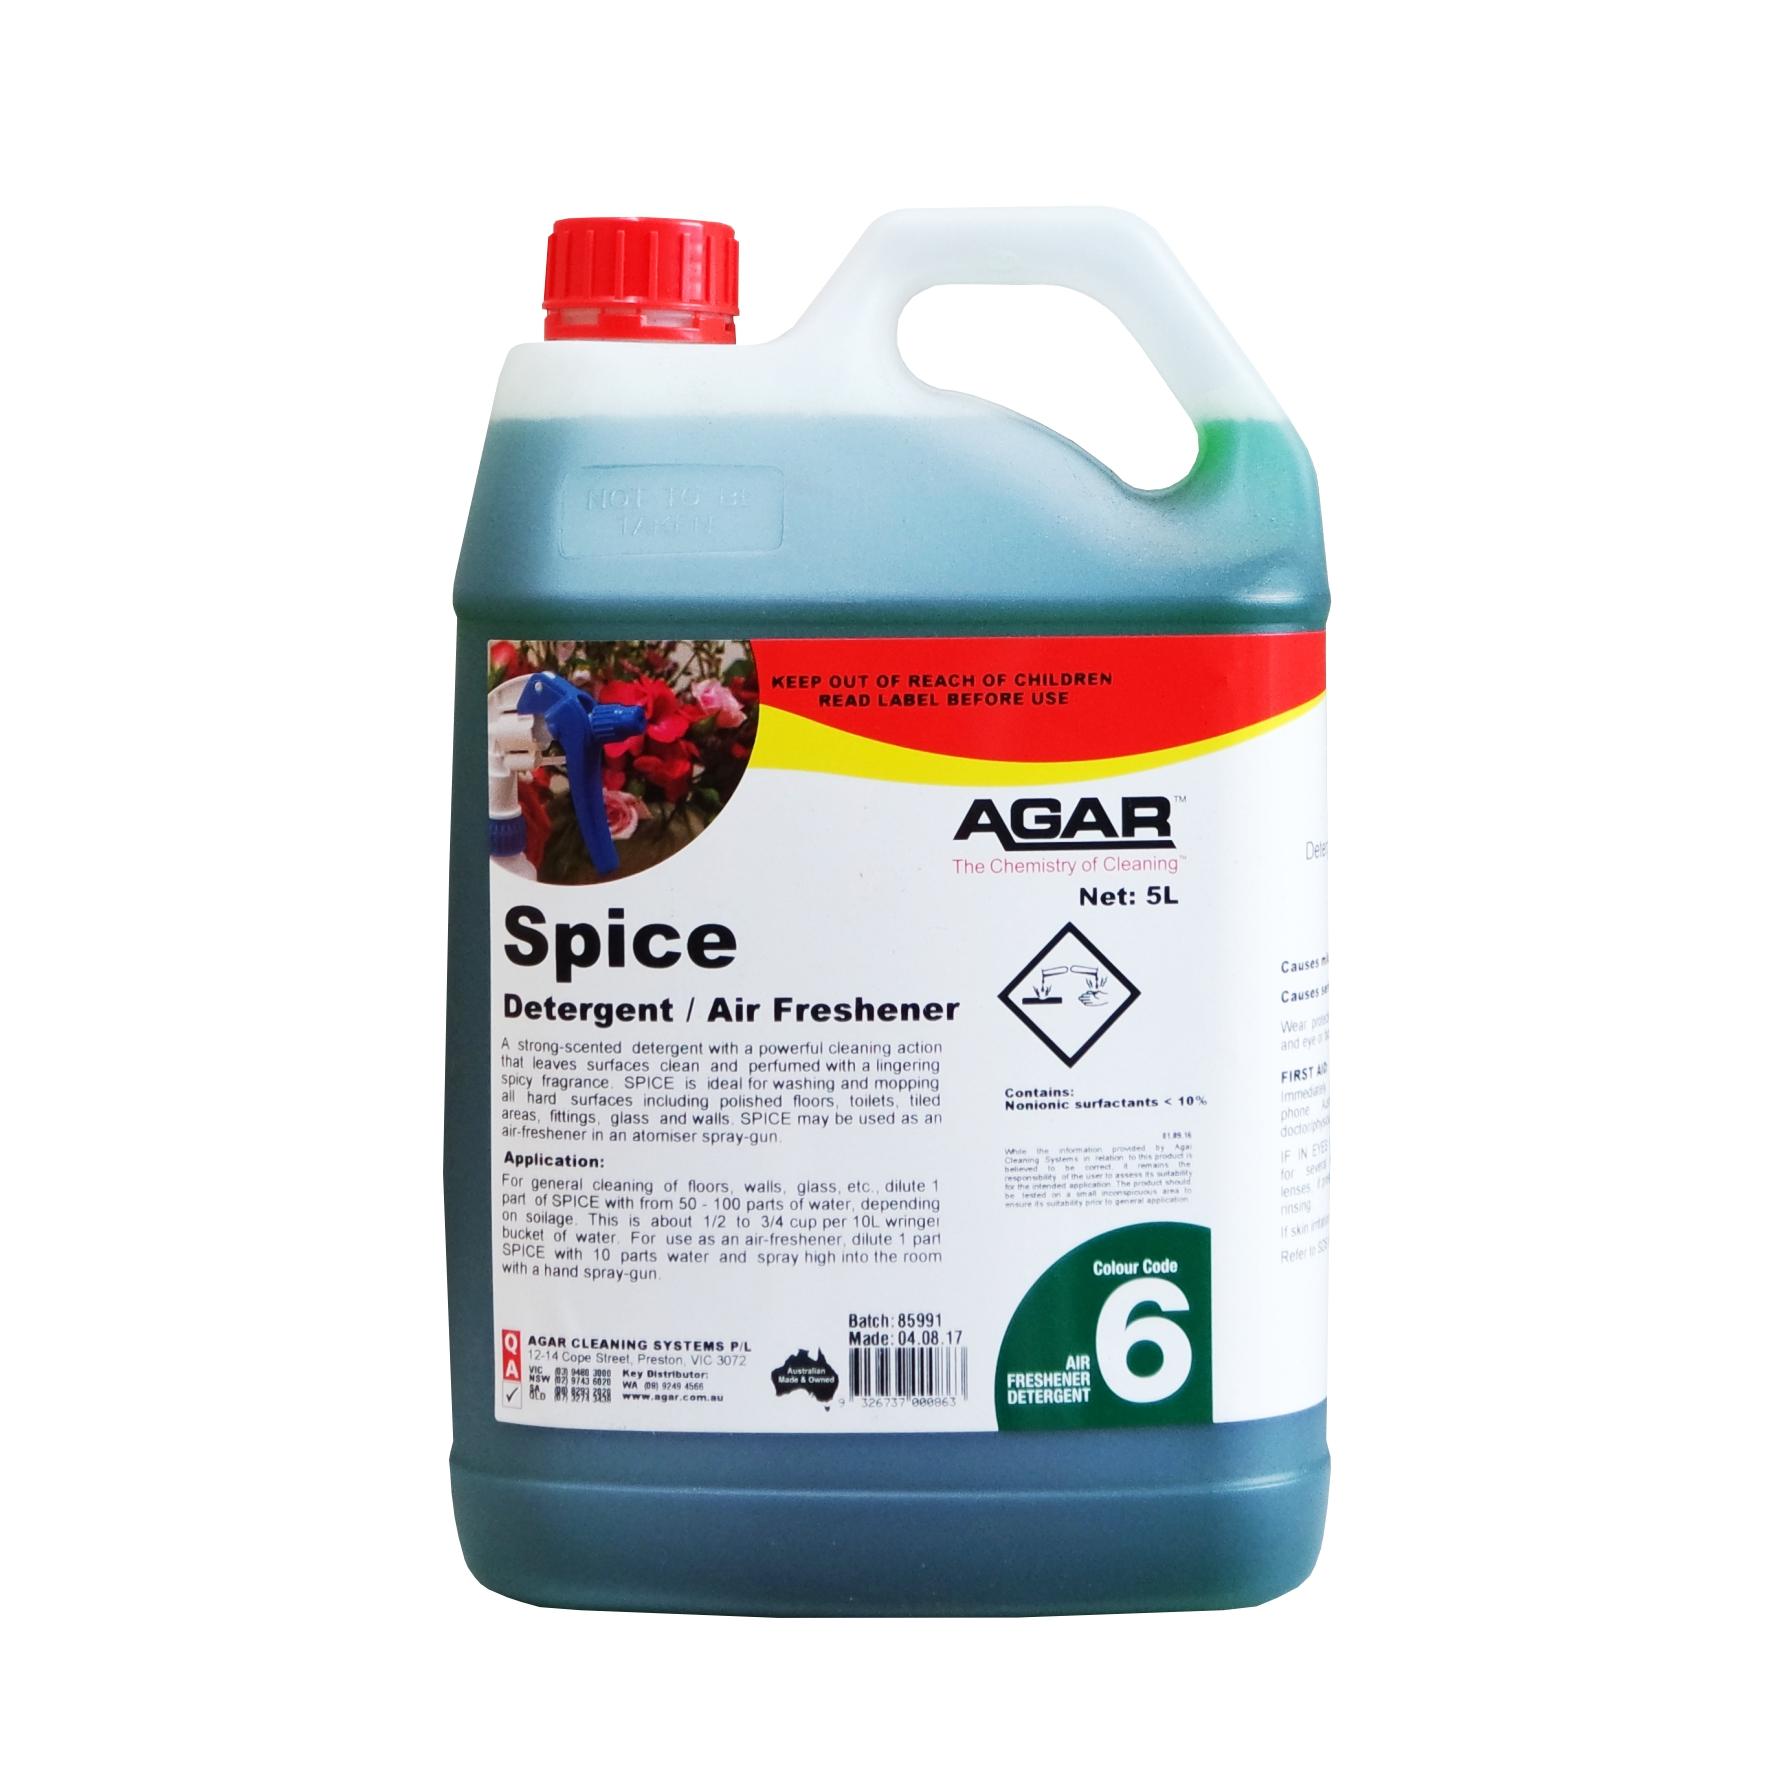 Spice Deodoriser Agar Cleaning Systems